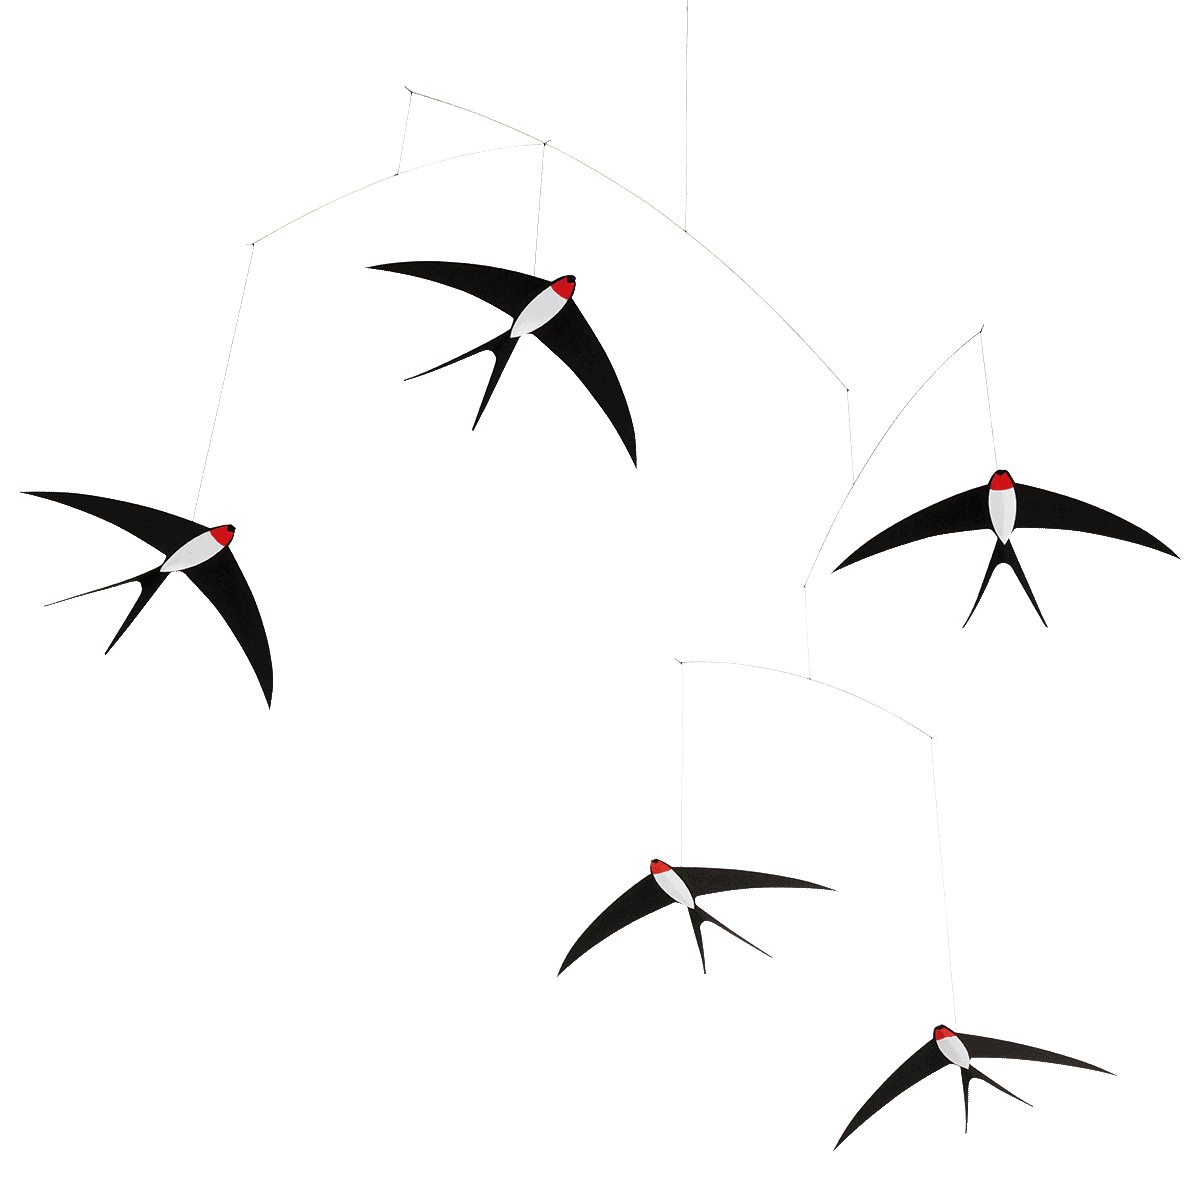 Móbile Andorinhas Voando 5 Flensted &Amp;Bull; Flying Swallows 5 - 1 &Amp;Bull; Deezign